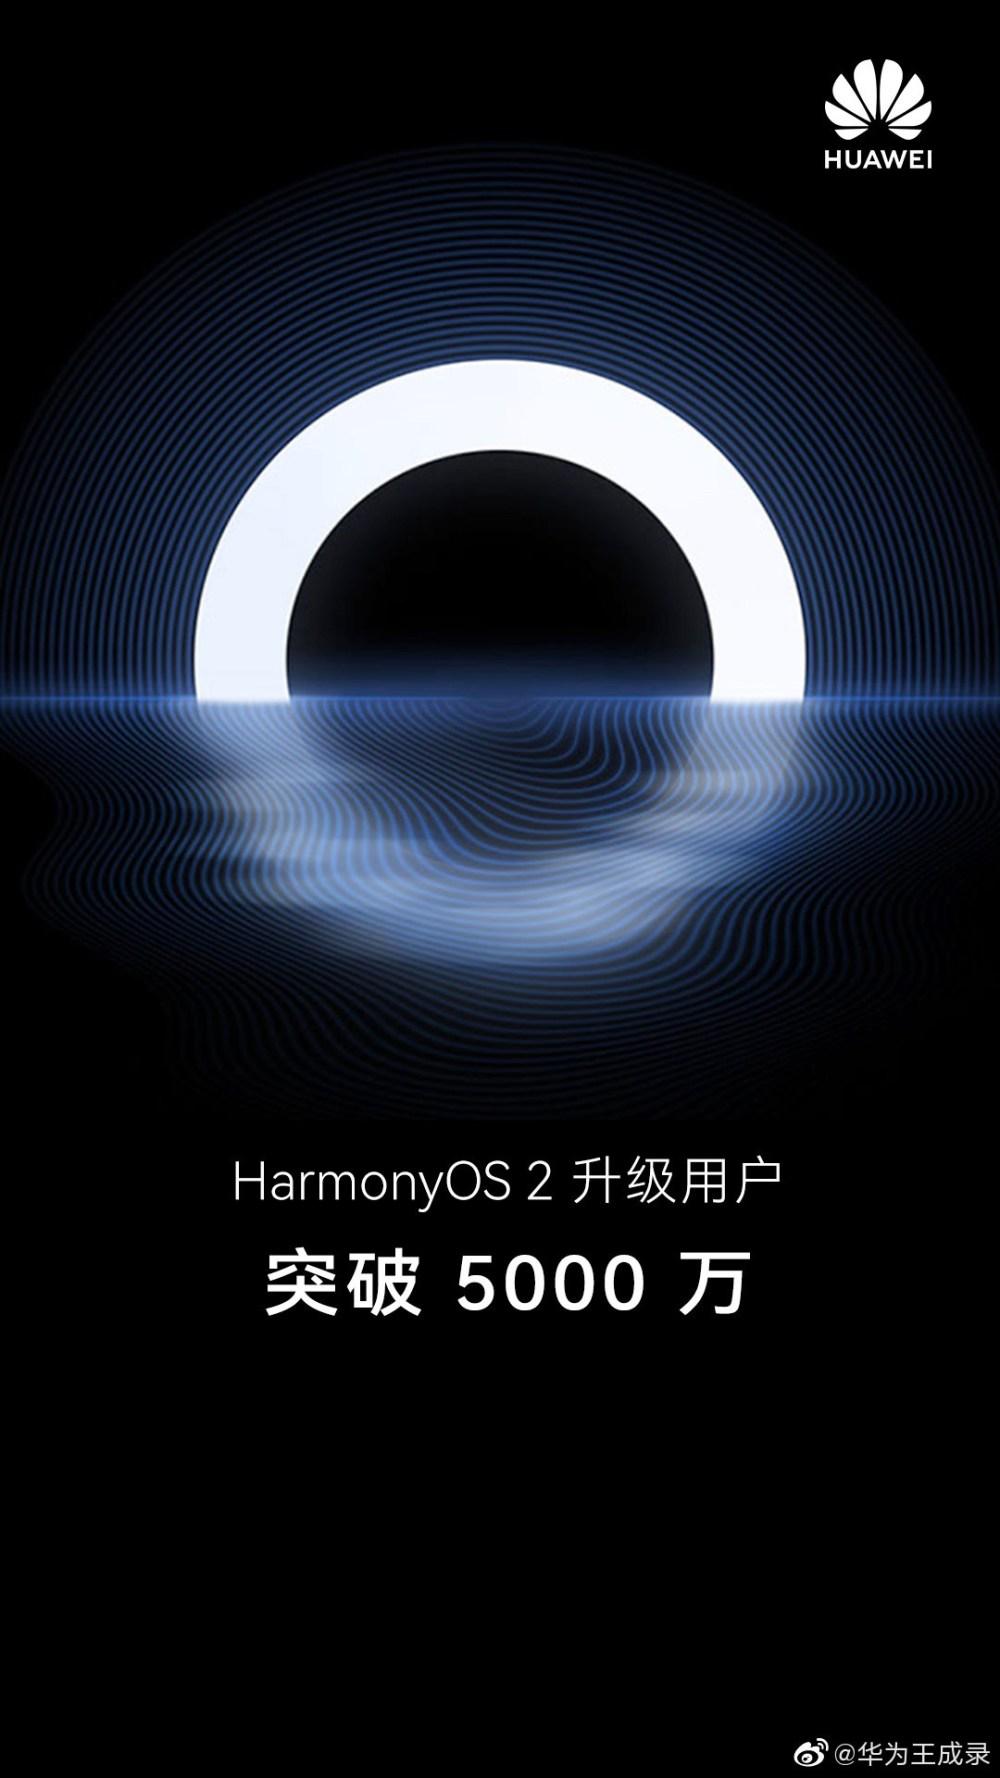 HarmonyOS 50 Million Milestone